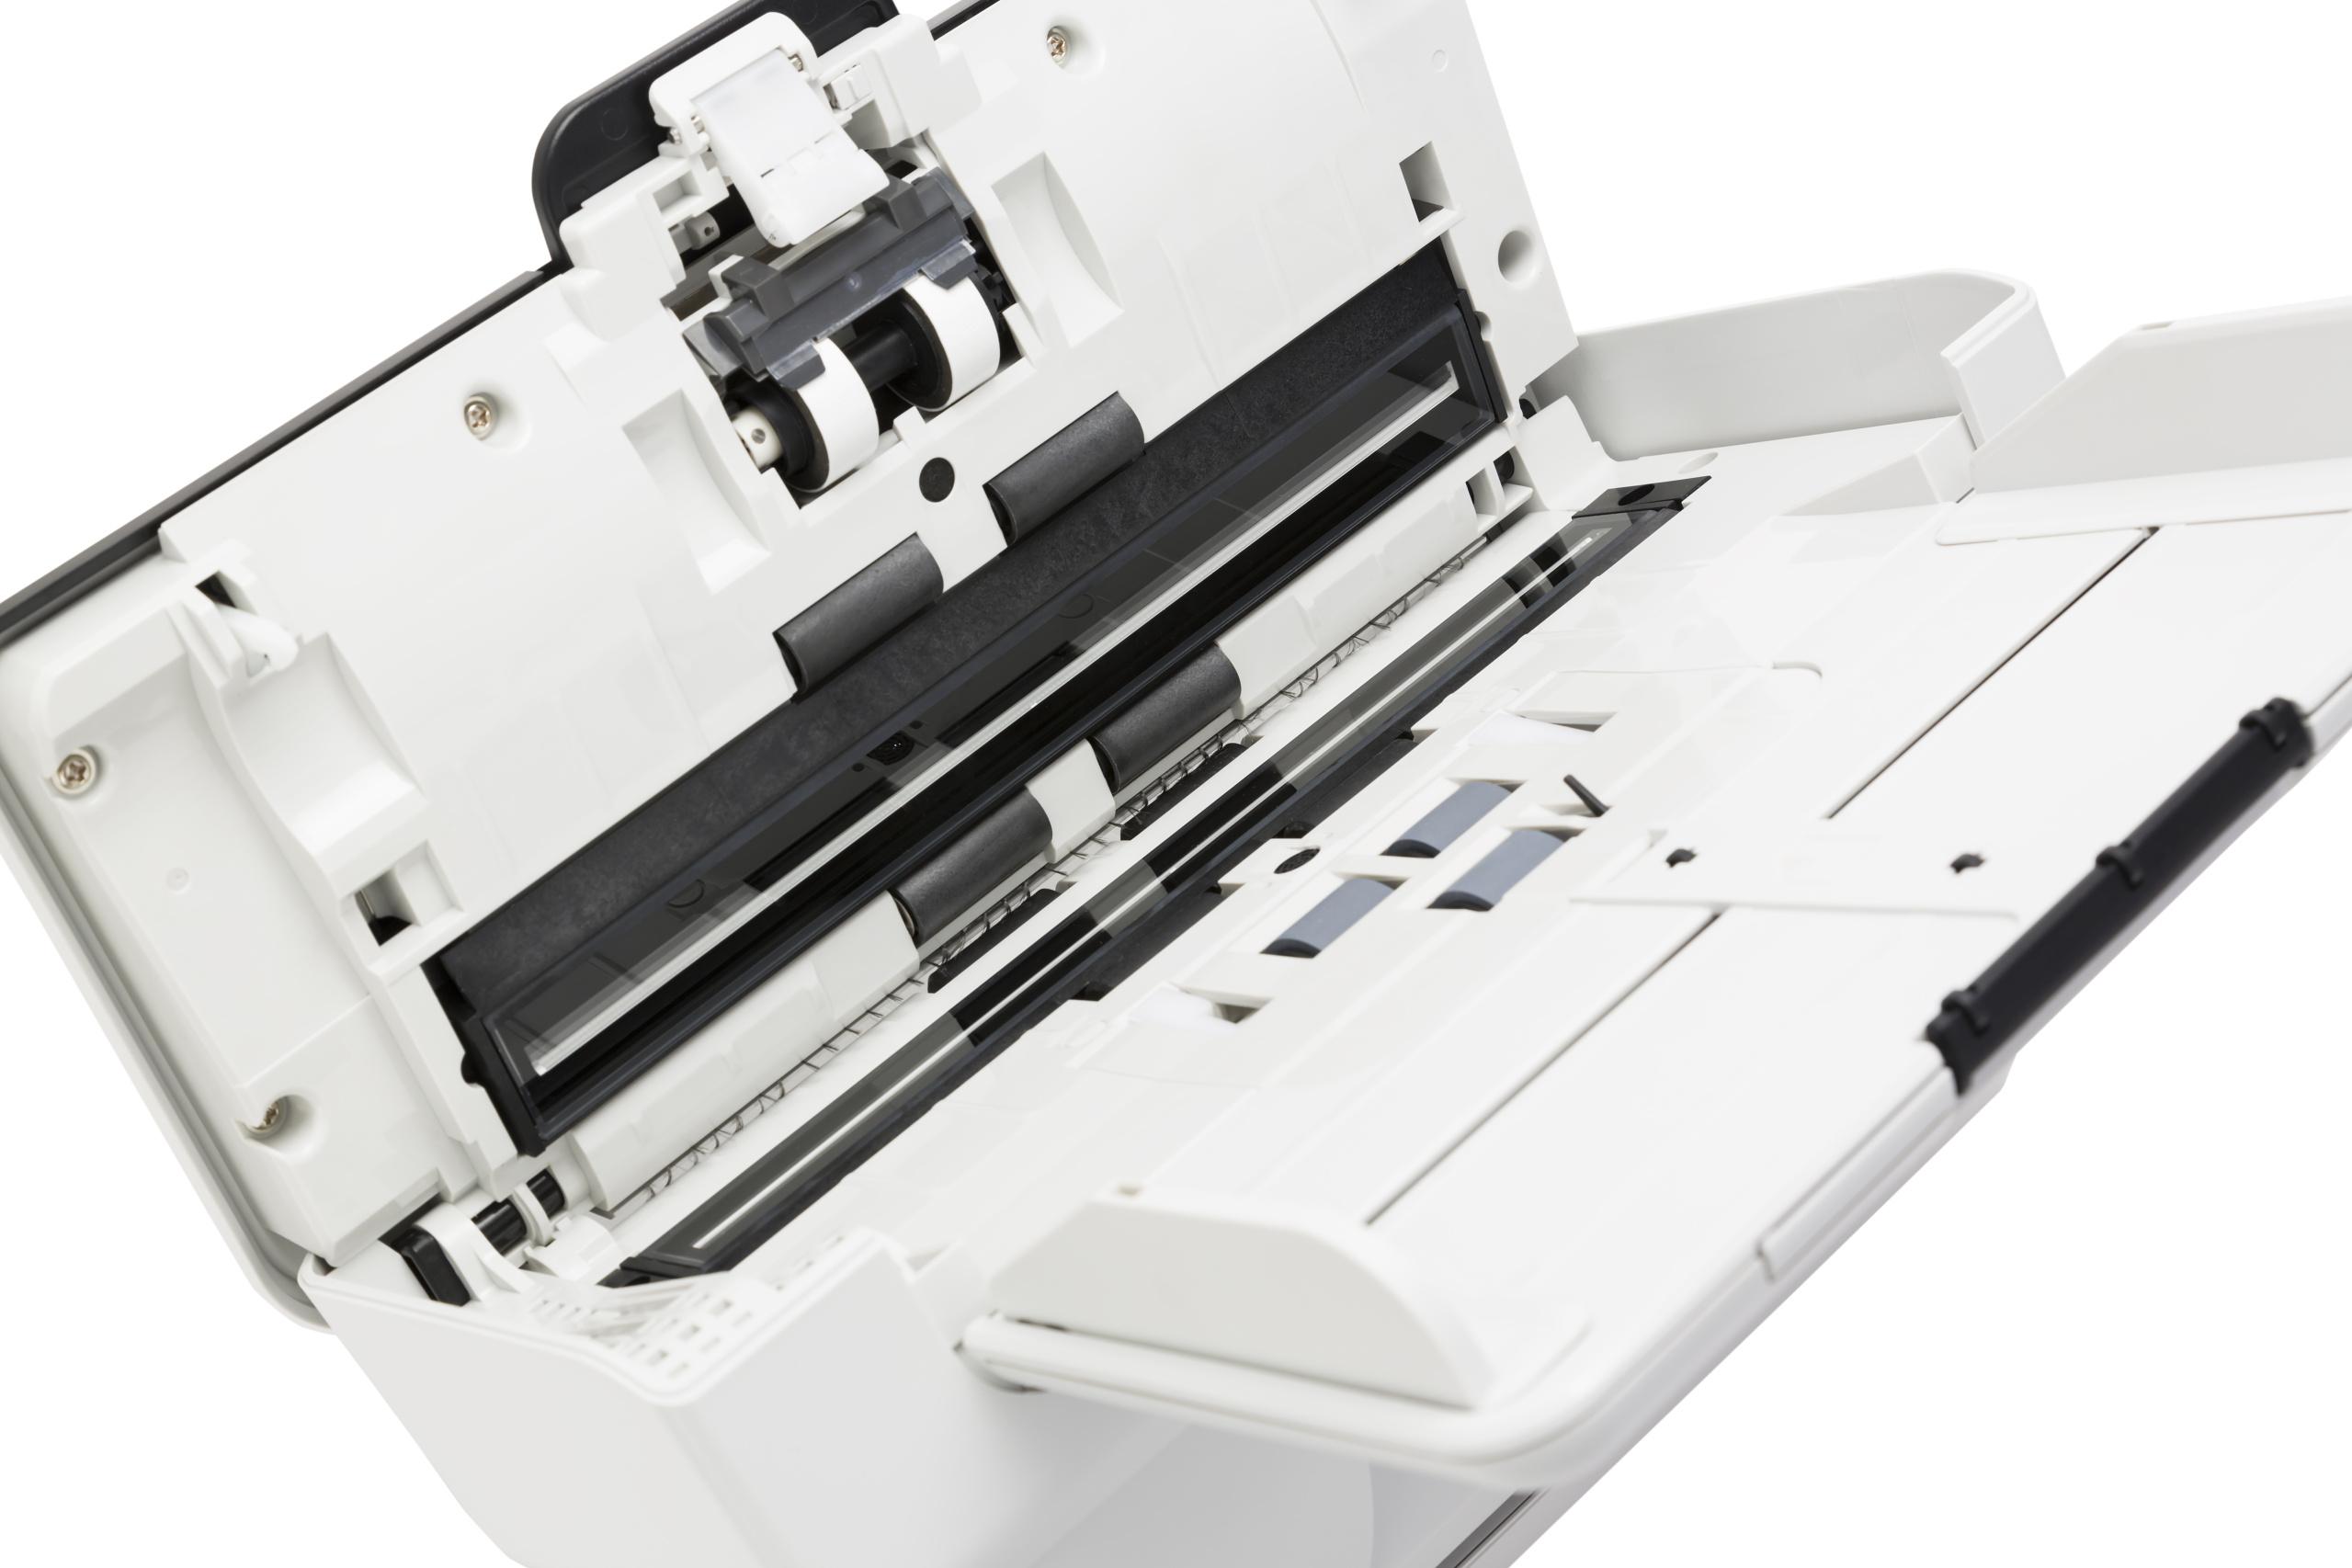 Optimal document scanning begins with paper handling - Alaris